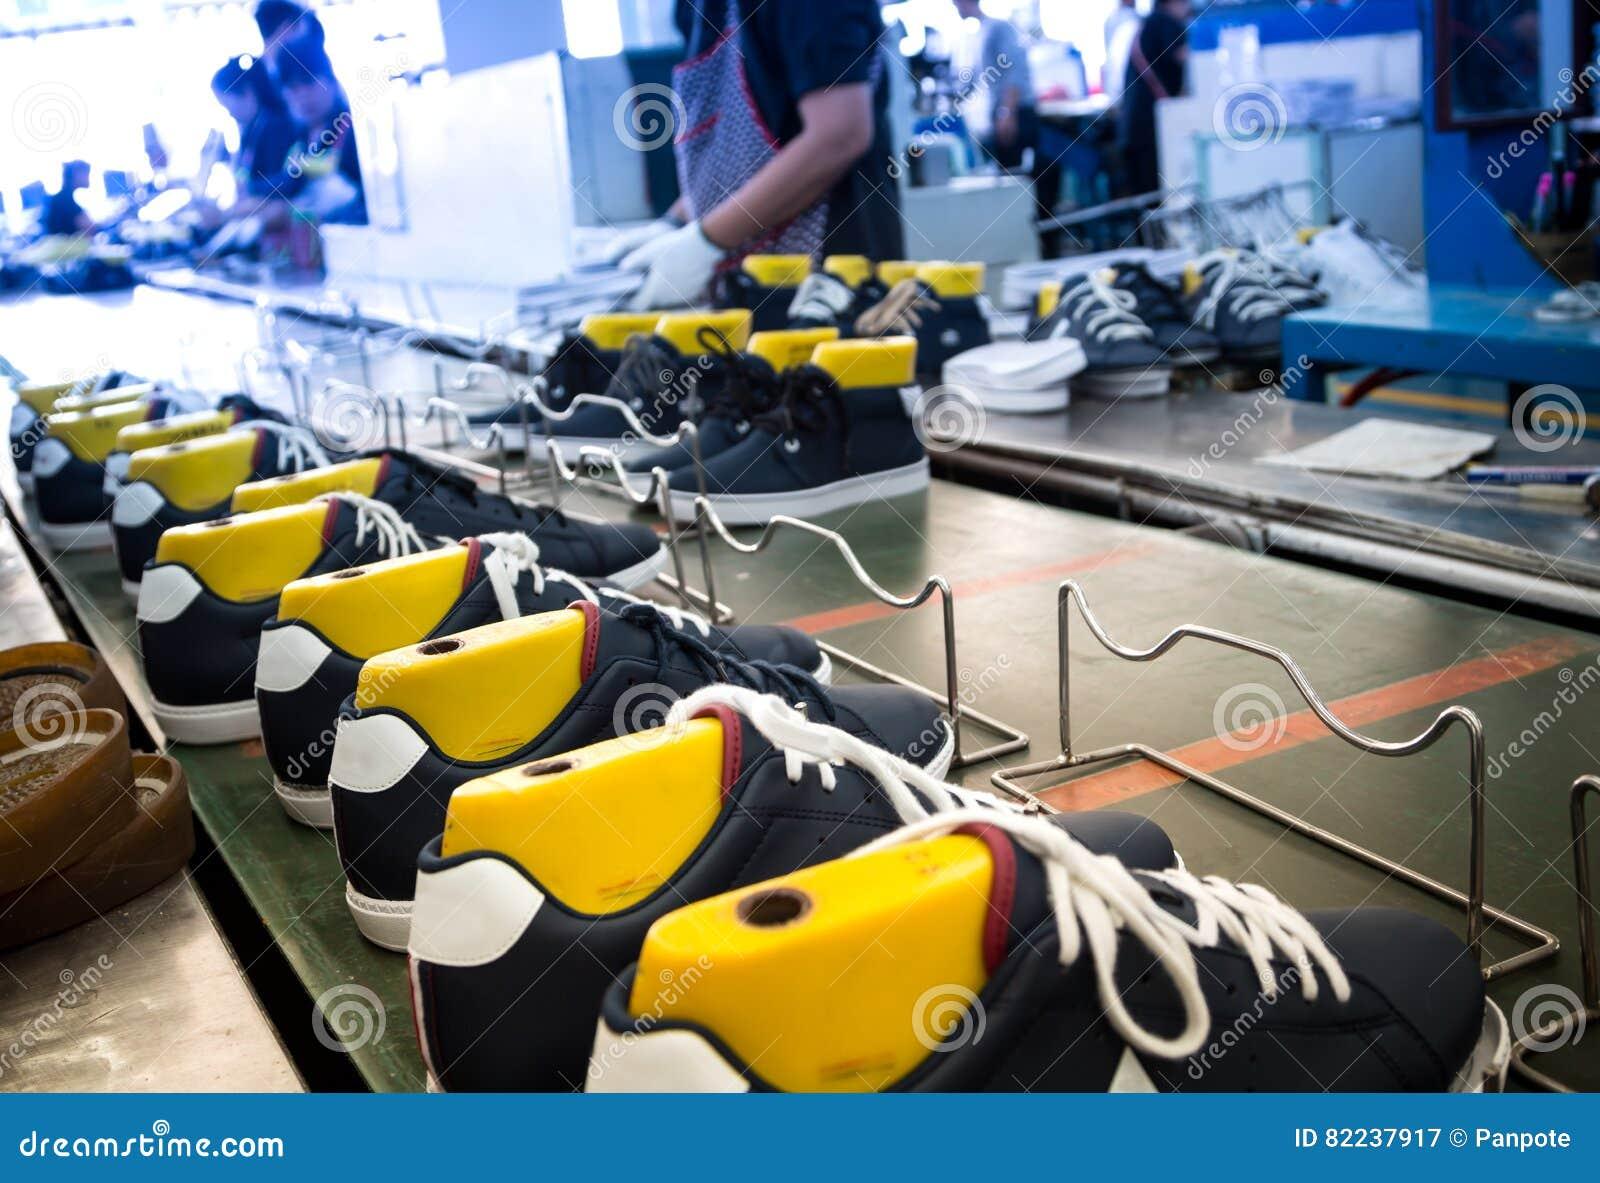 Shoe making factory stock image. Image